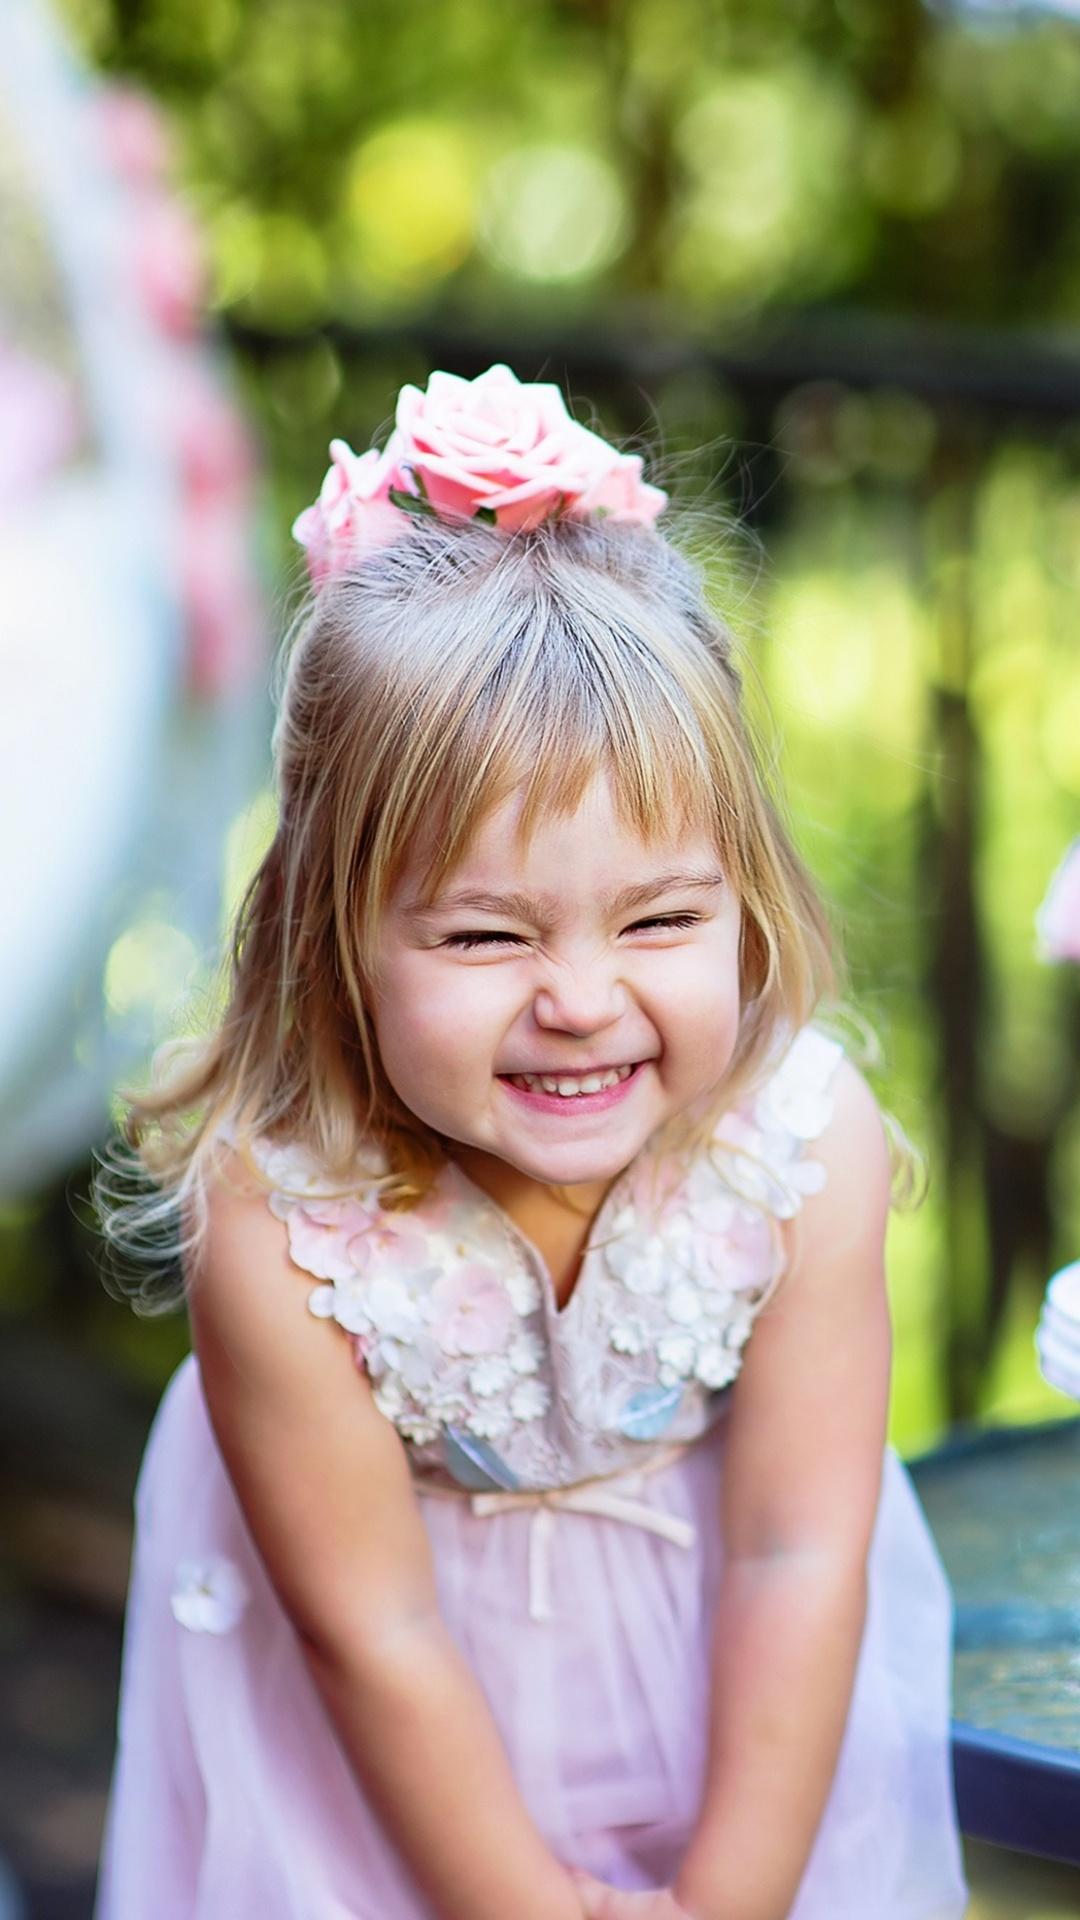 joy-girl-child-u0.jpg